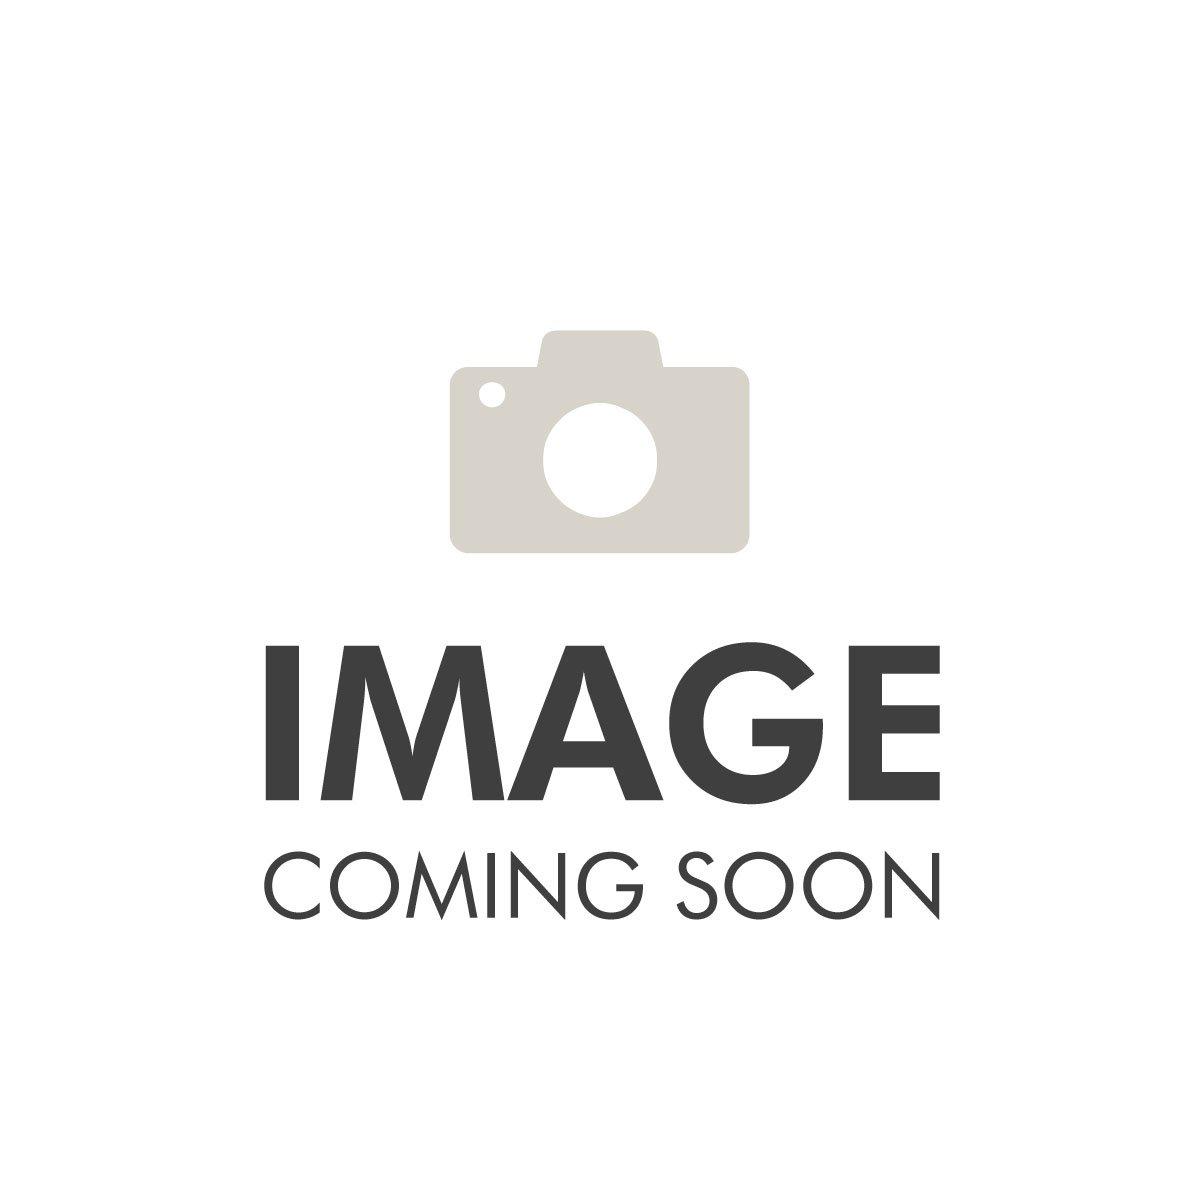 Clarins Slimming Experts Body Lift Celluite Control 200ml &Exfoliating